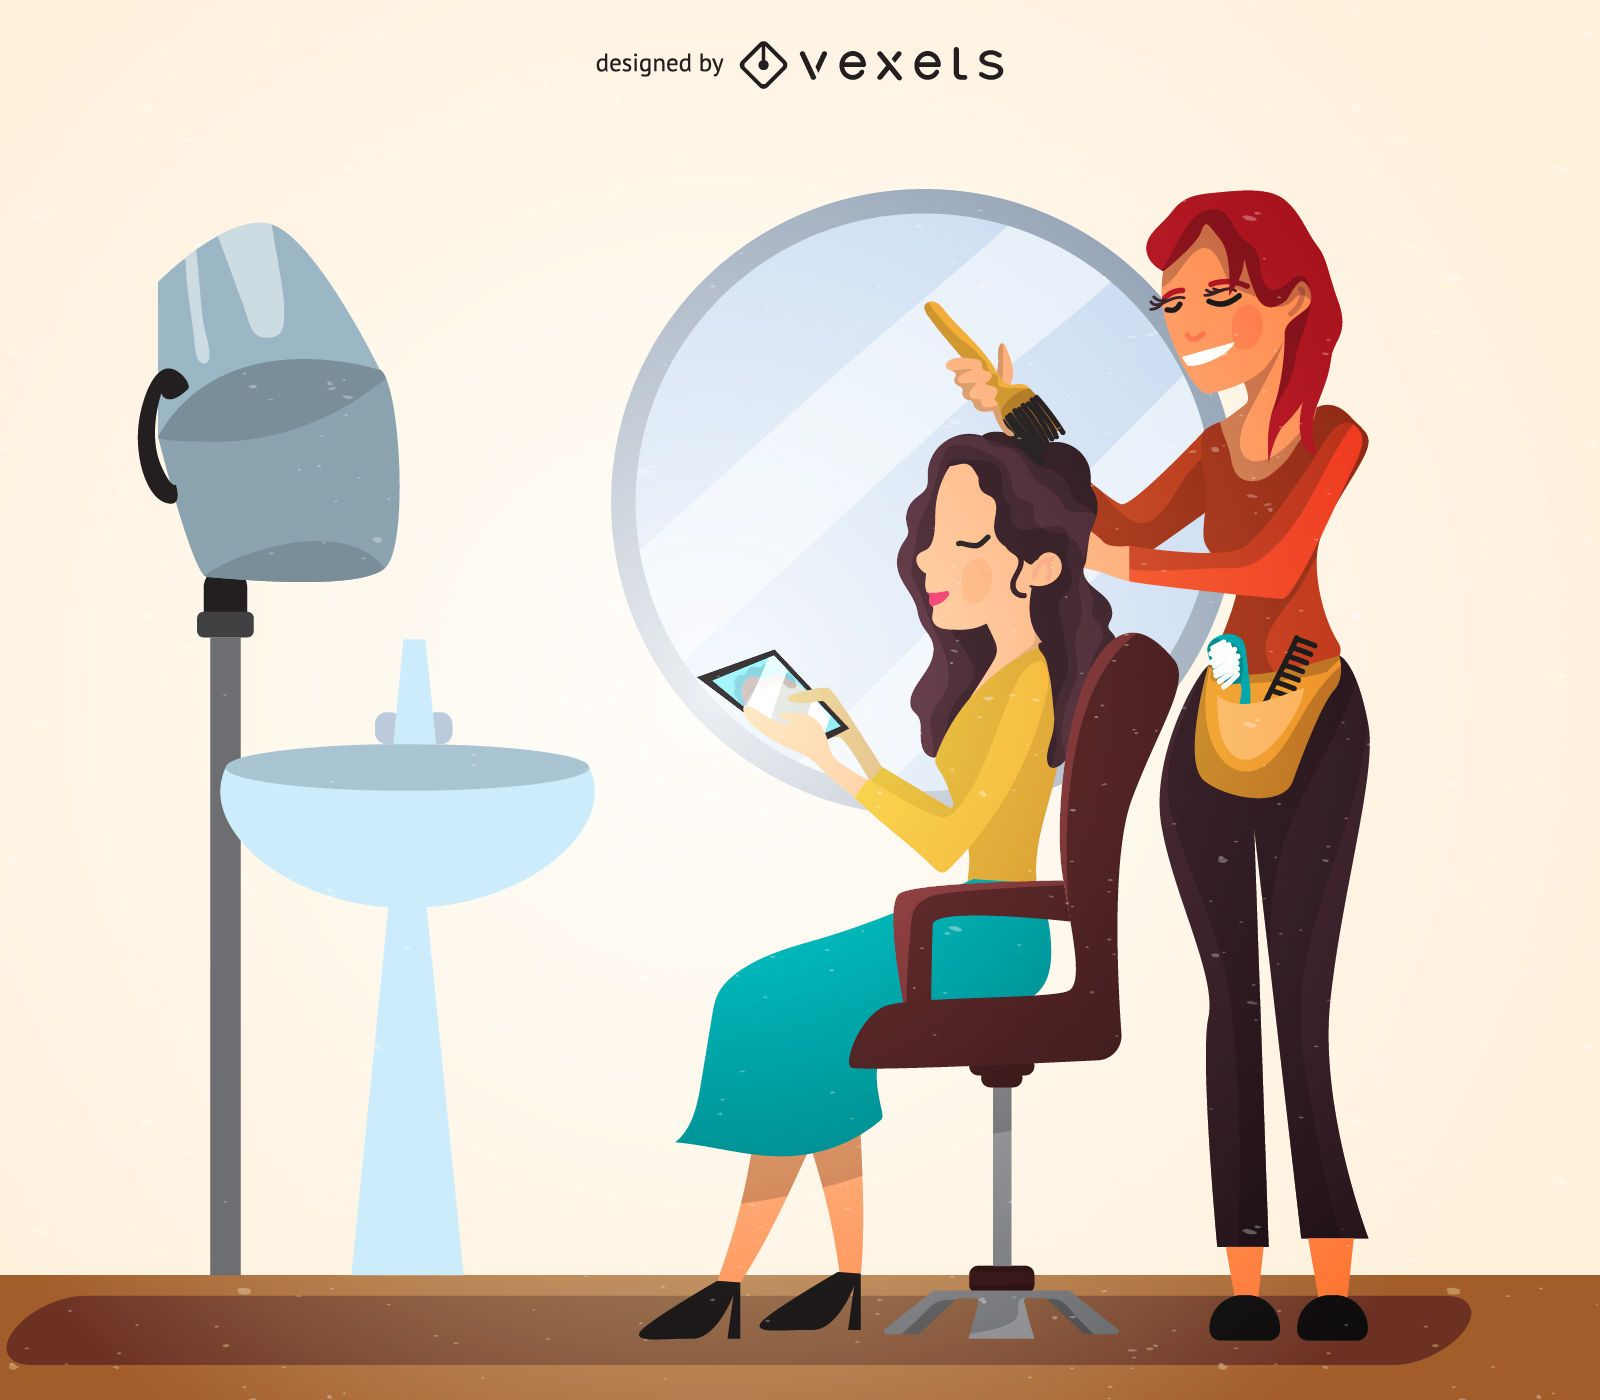 Hairdressing studio illustration